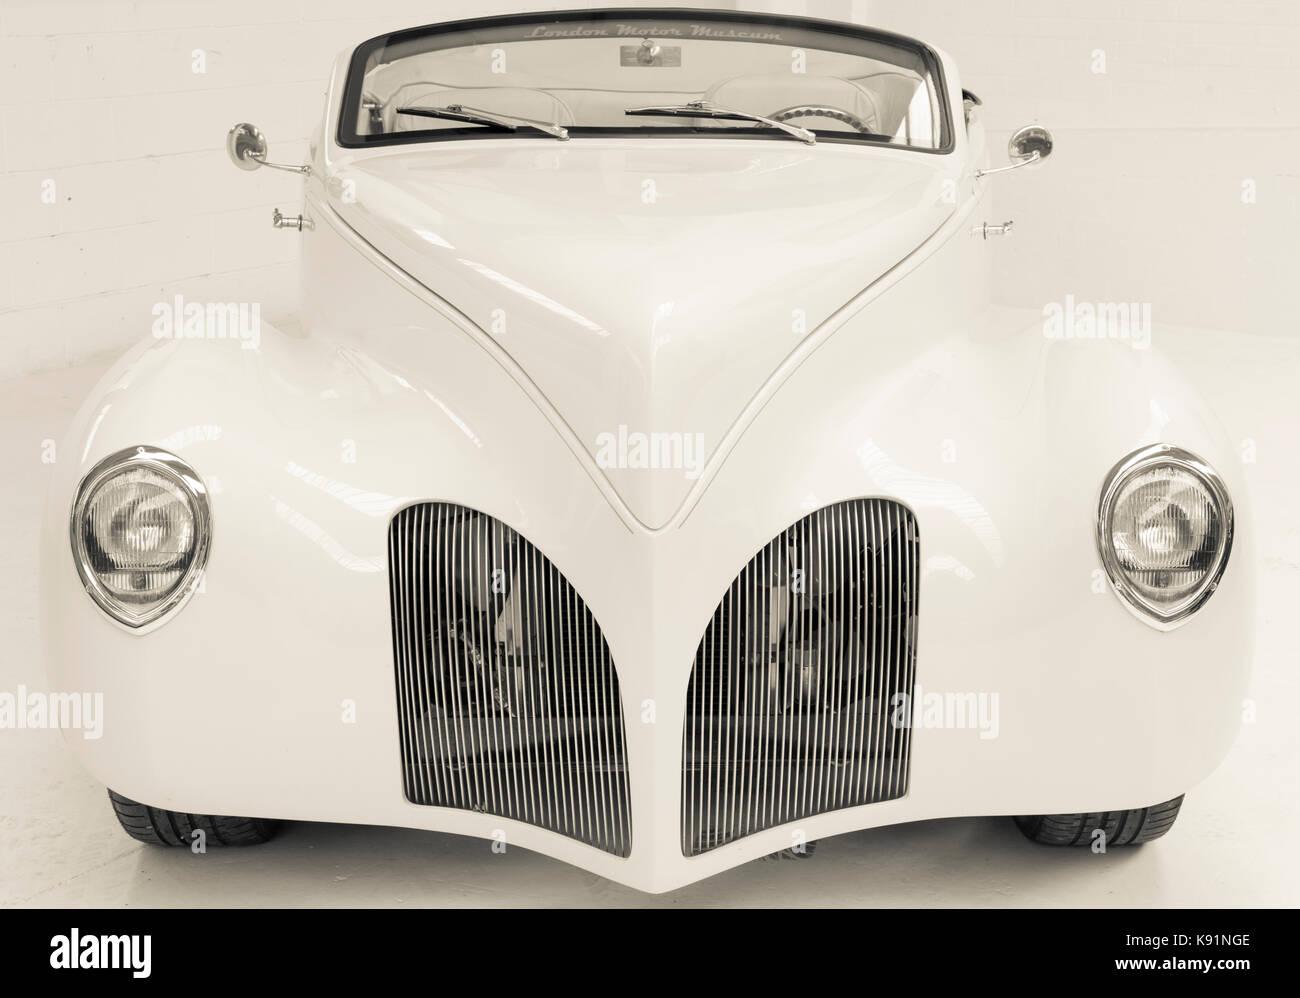 1939 Lincoln Zephyr Custom Car Chopped White Stock Photo